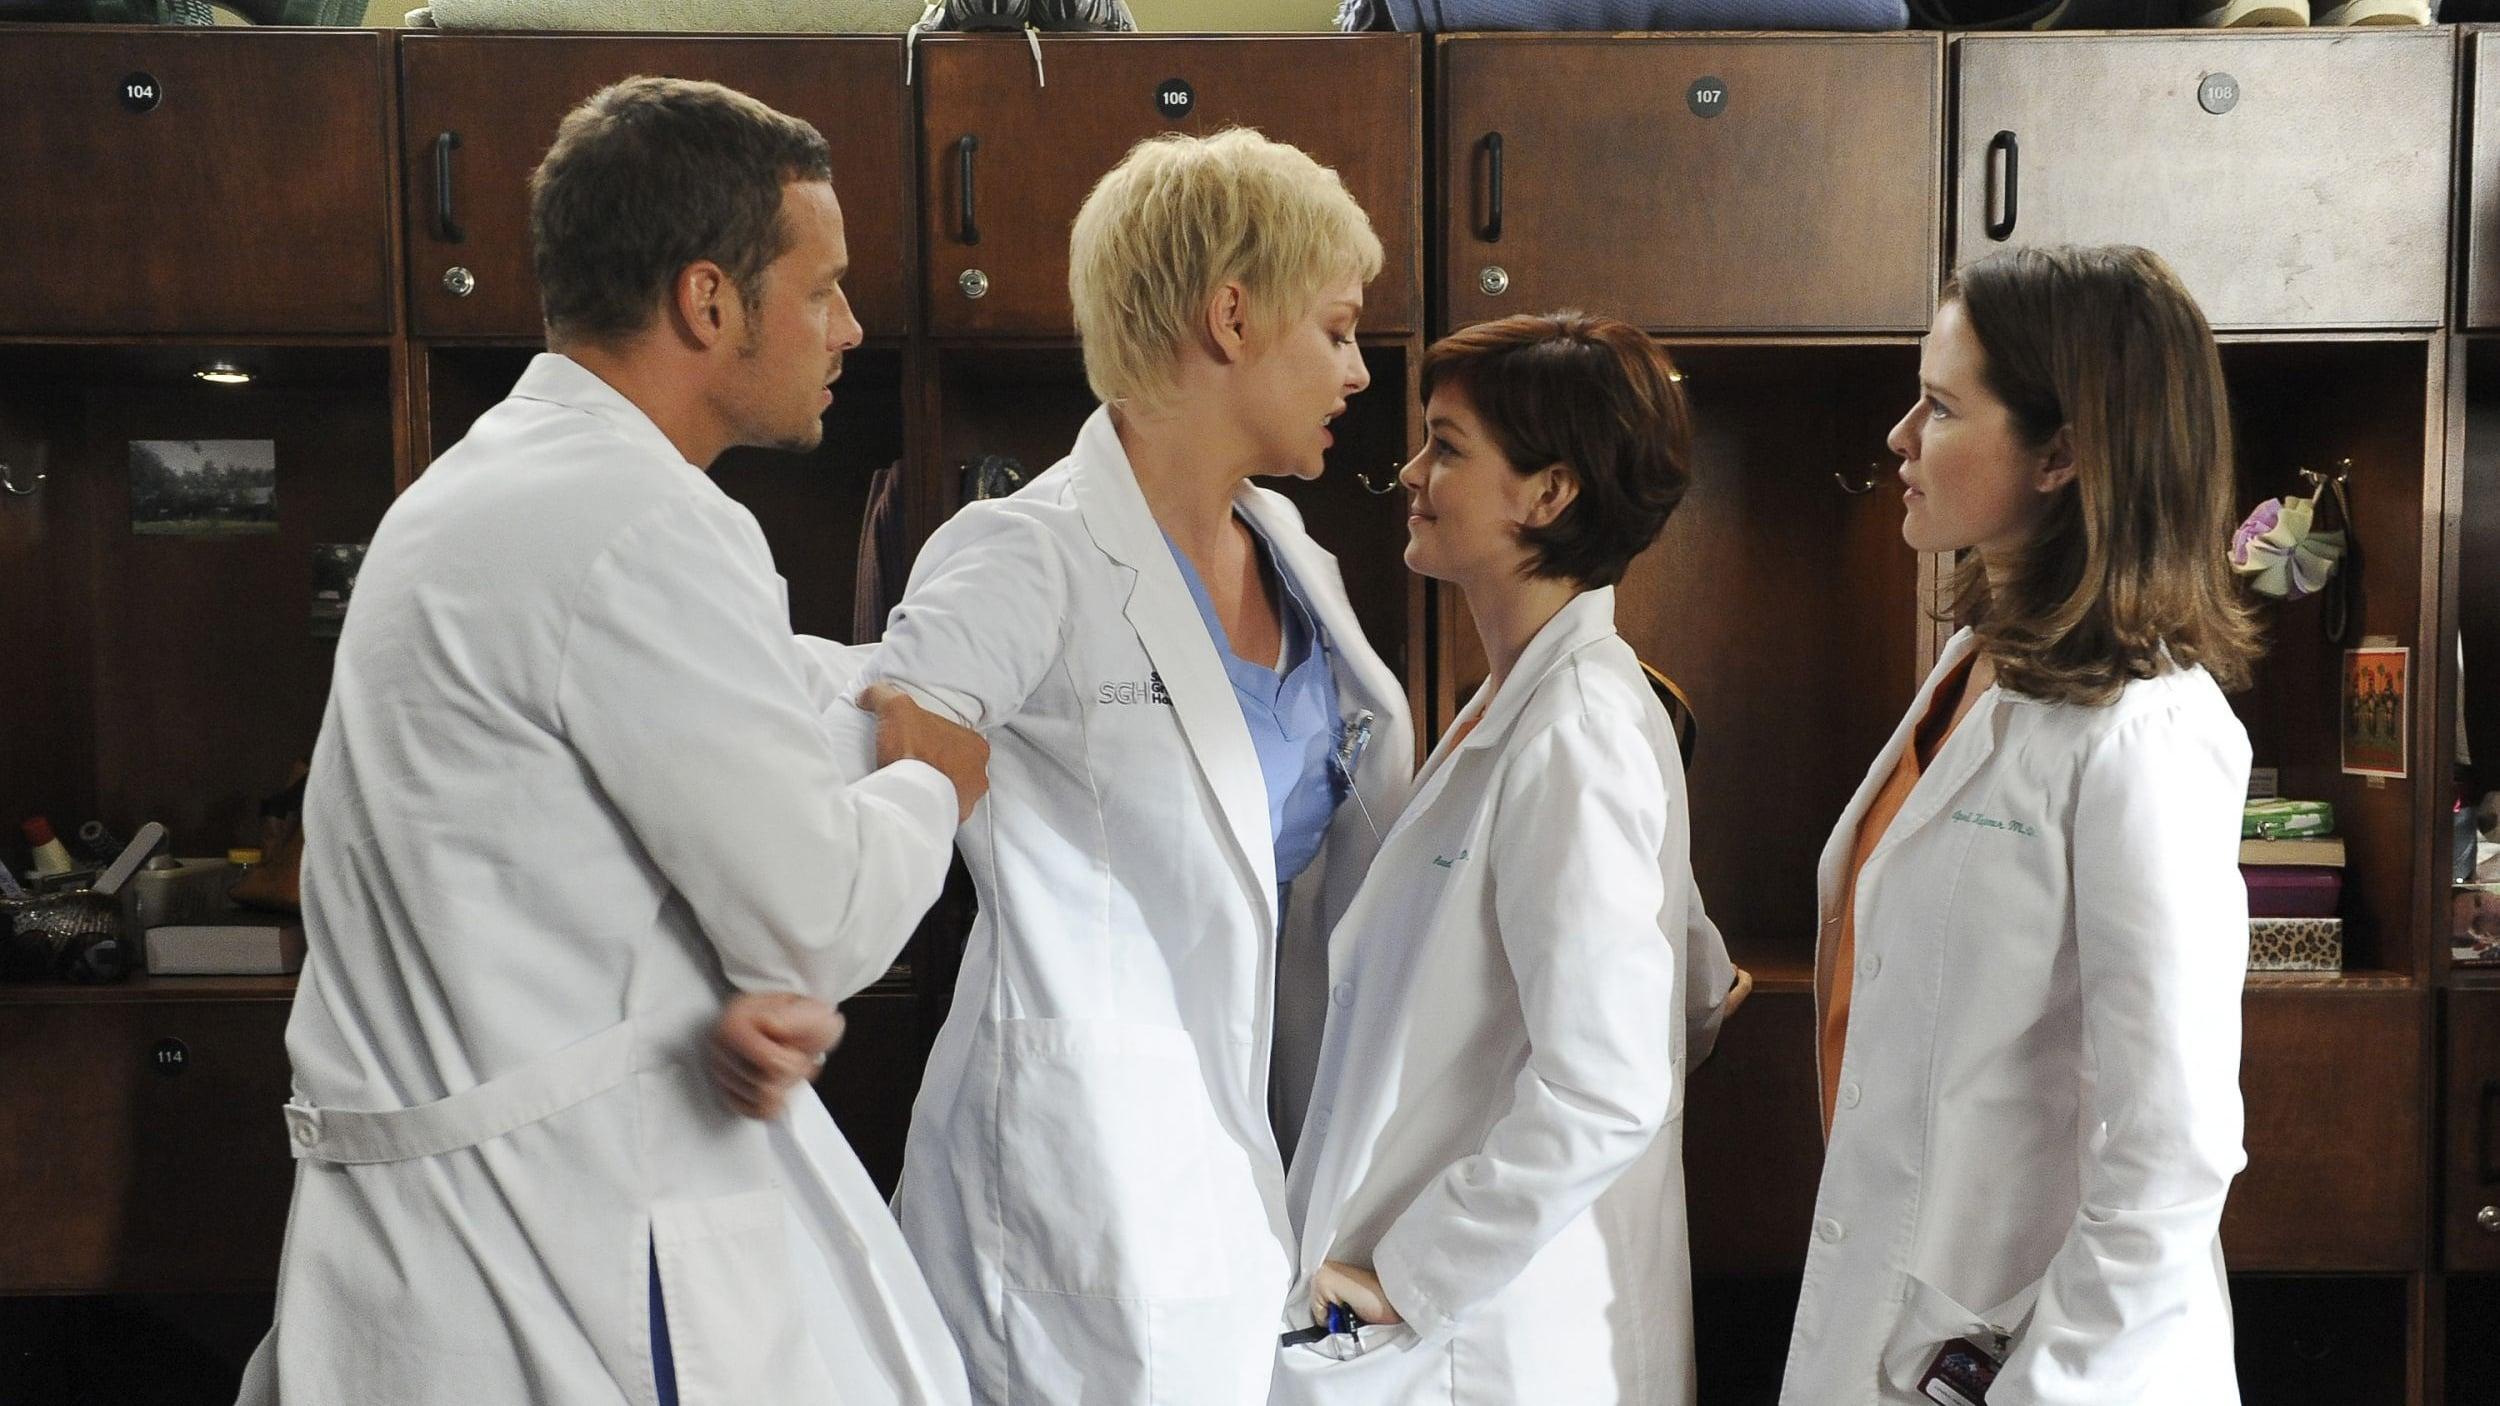 Grey\'s Anatomy: Season 6 Episode 5 S06E05 Openload Watch Free ...